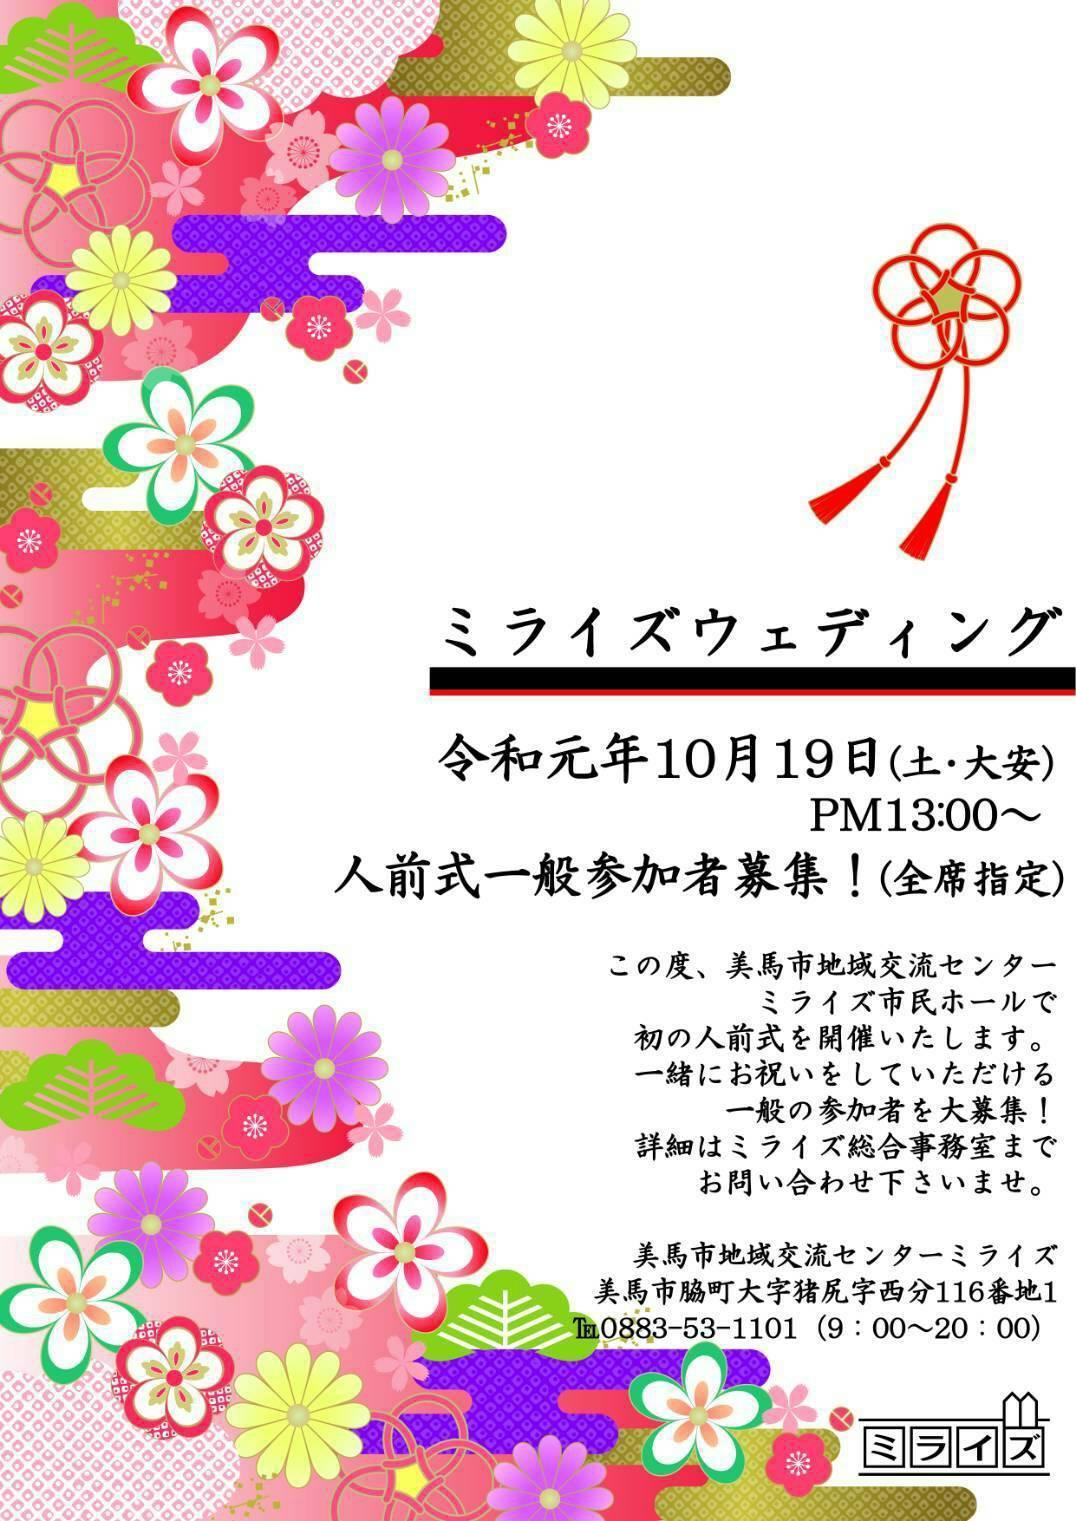 10月6日(日)朝の気温9℃。_c0089831_04500420.jpeg